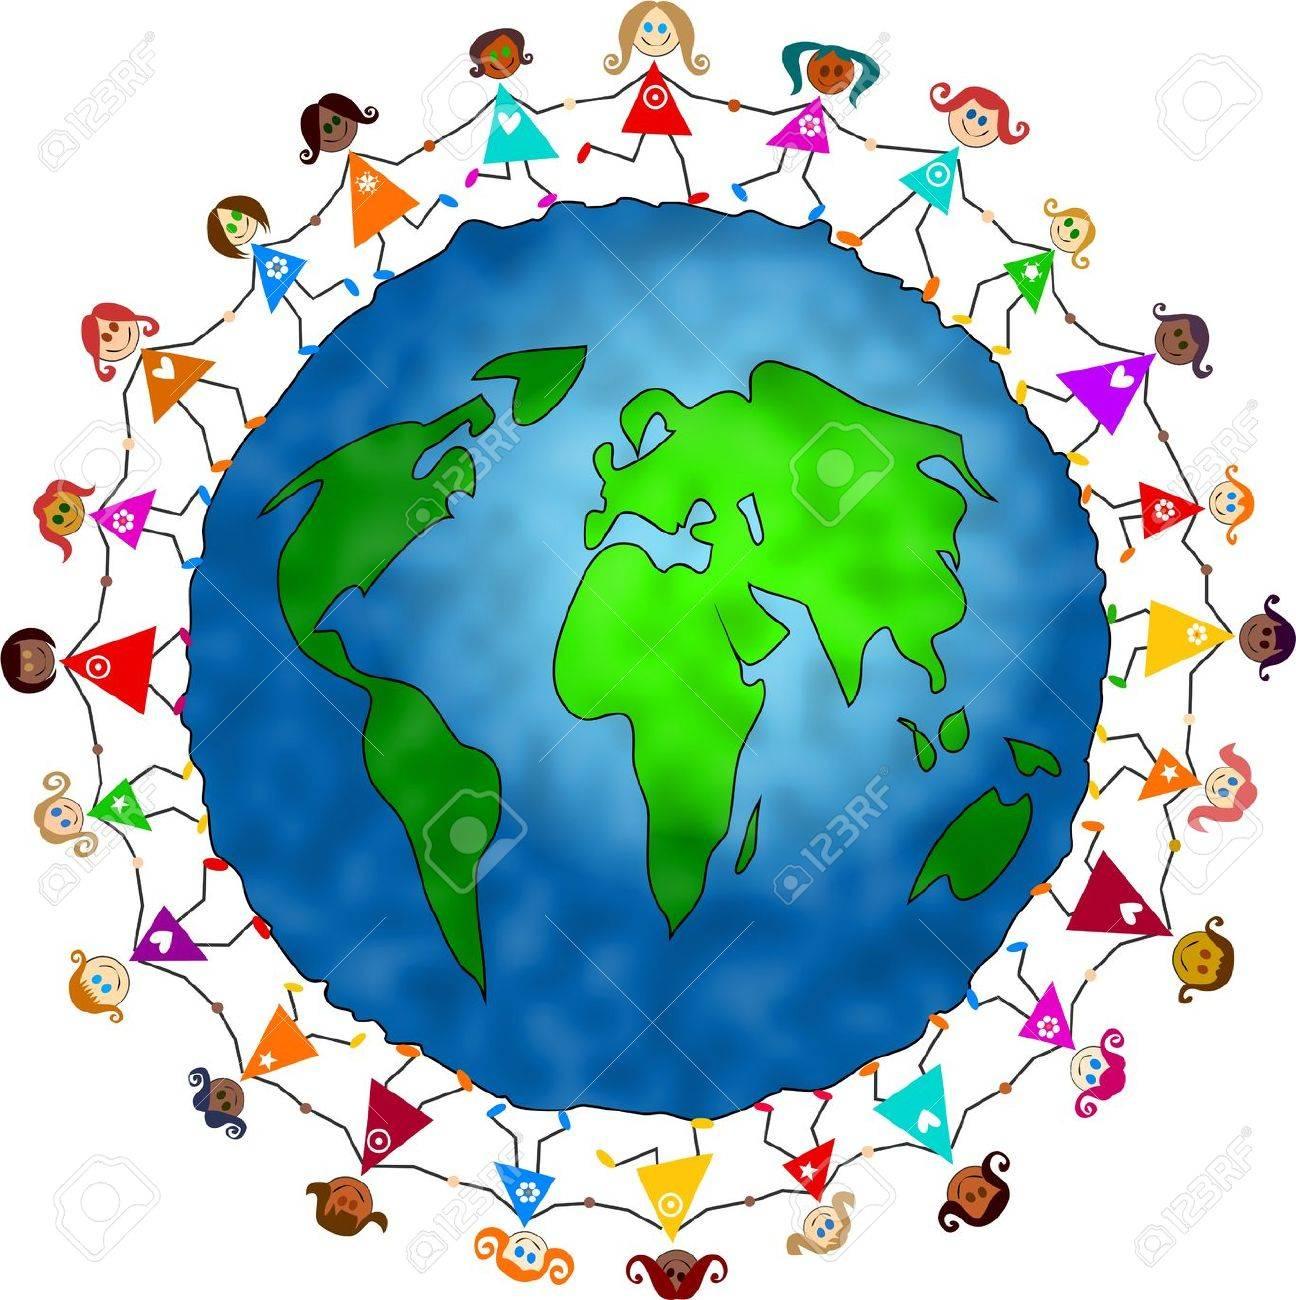 Clipart world world unity. Portal